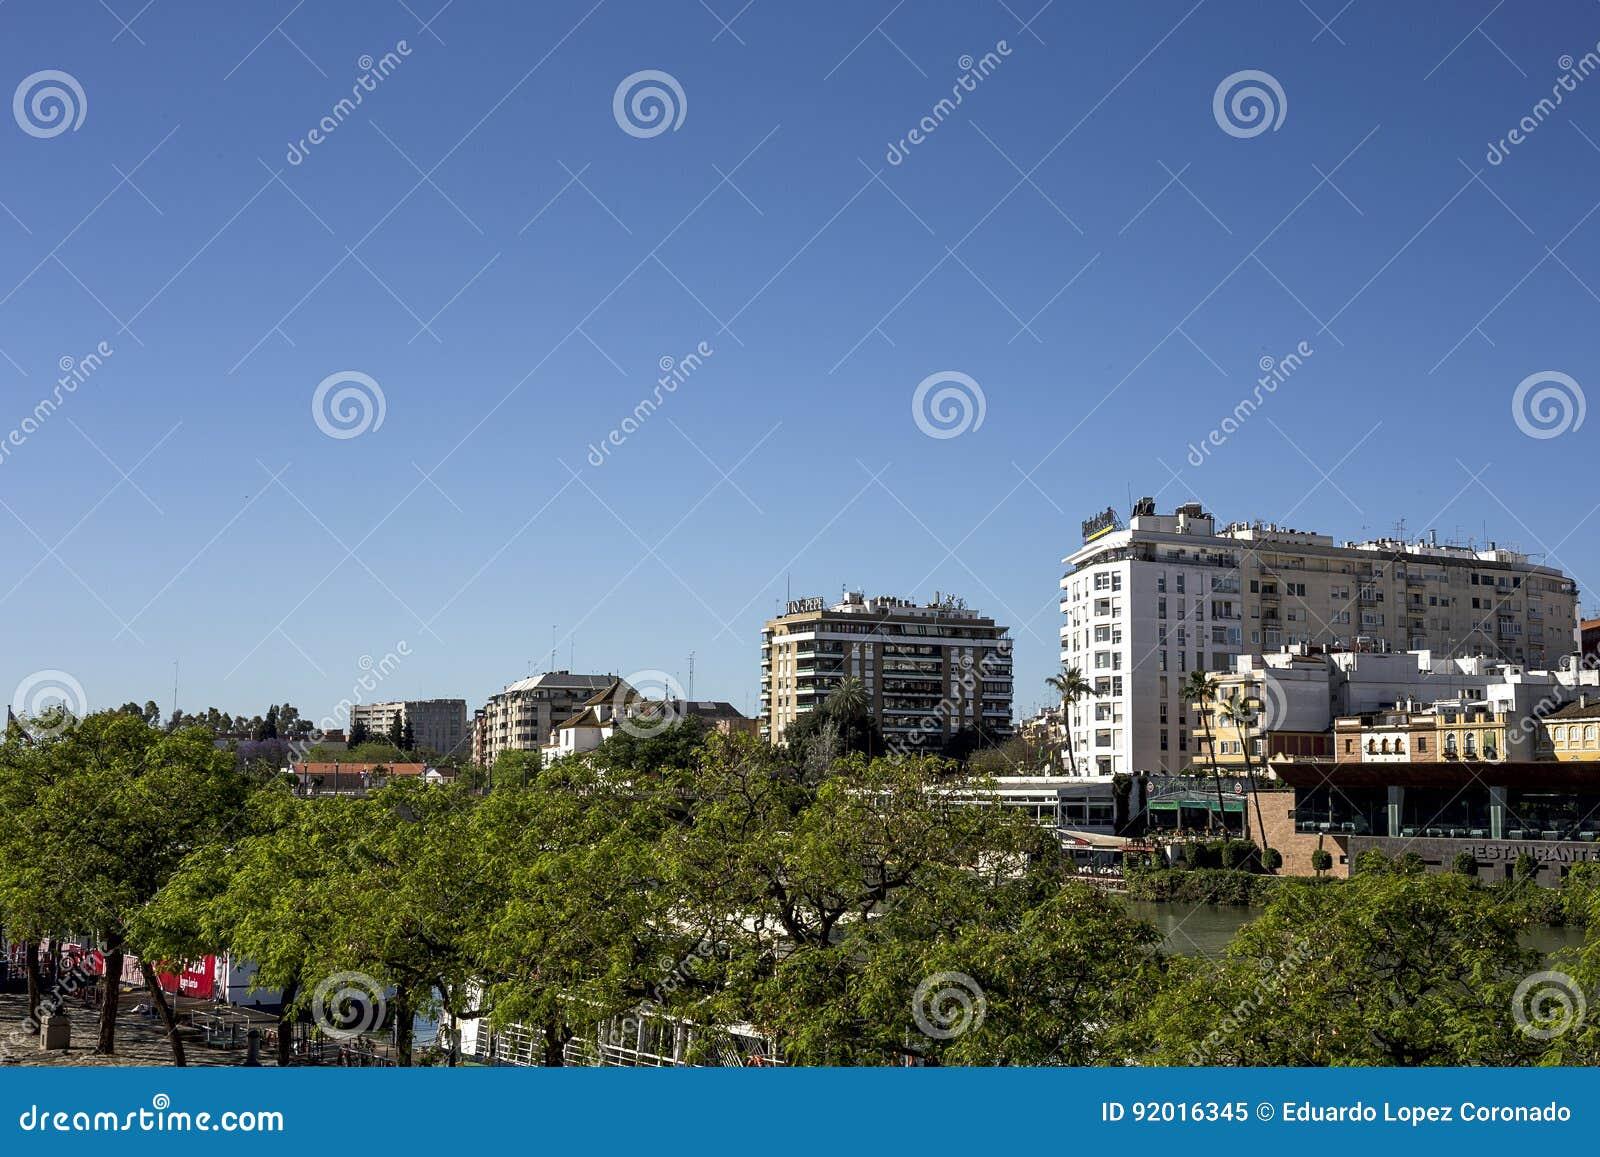 Calles y esquinas de Sevilla andalusia españa